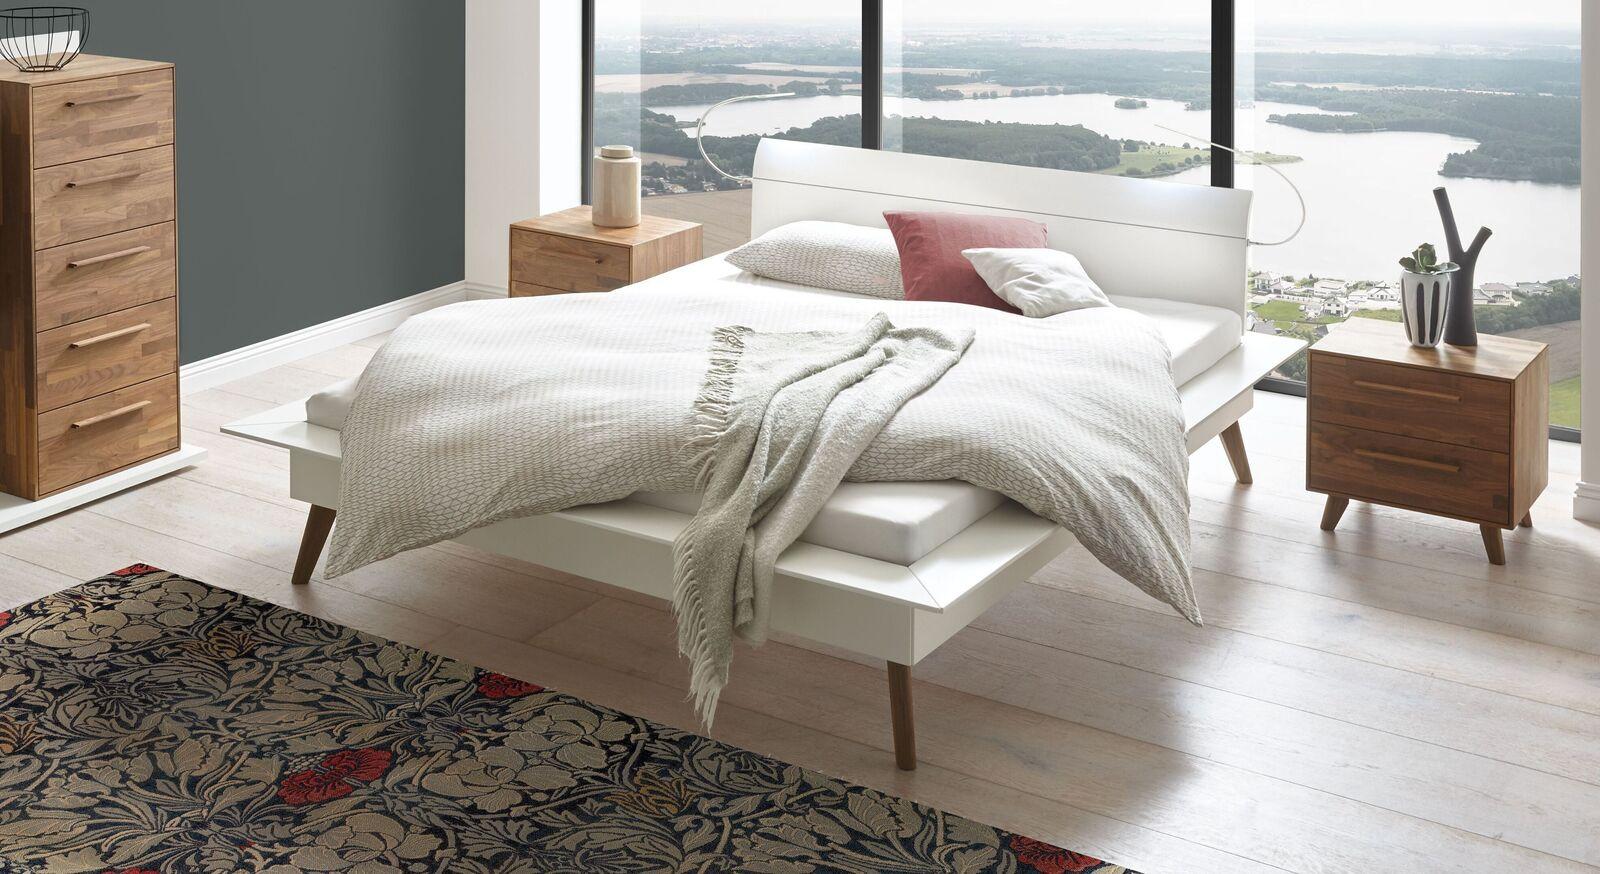 Bett Isonreo im Farbmix-Trend